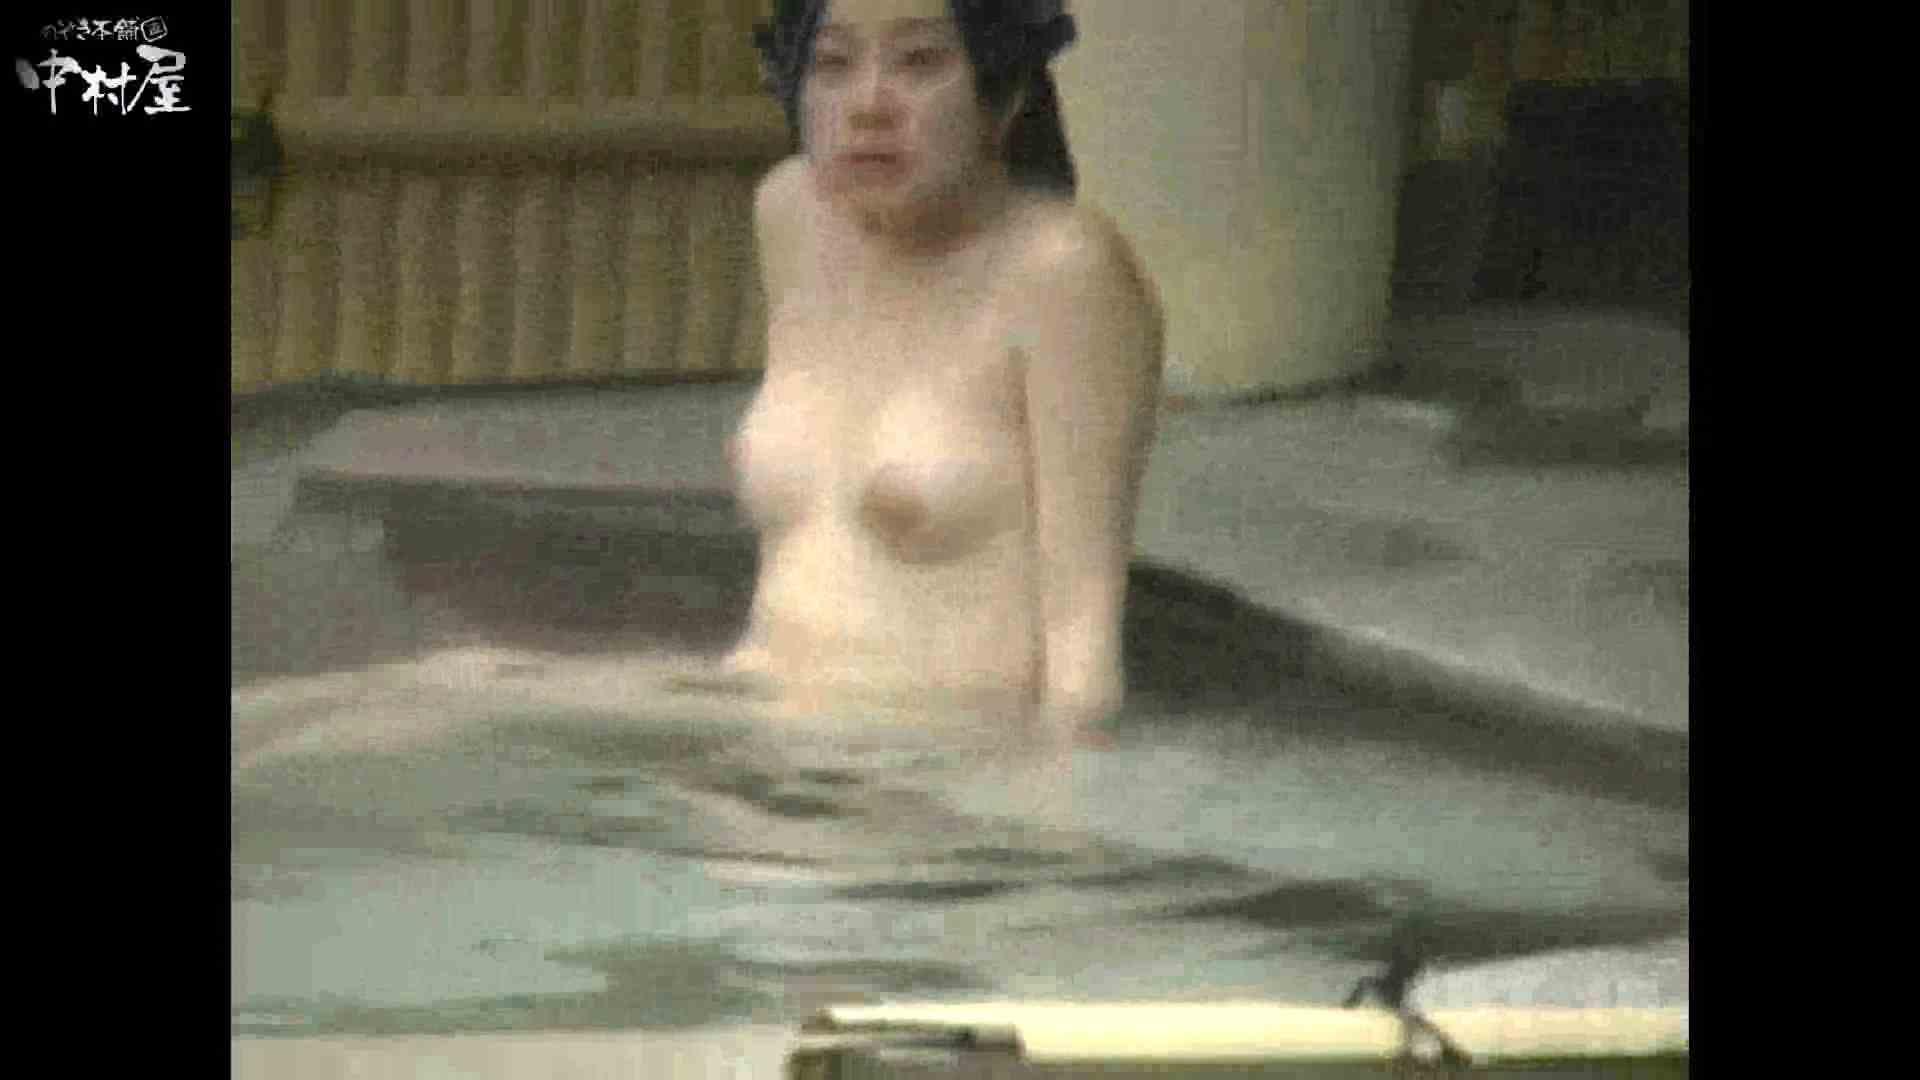 Aquaな露天風呂Vol.878潜入盗撮露天風呂十五判湯 其の三 潜入  87画像 28